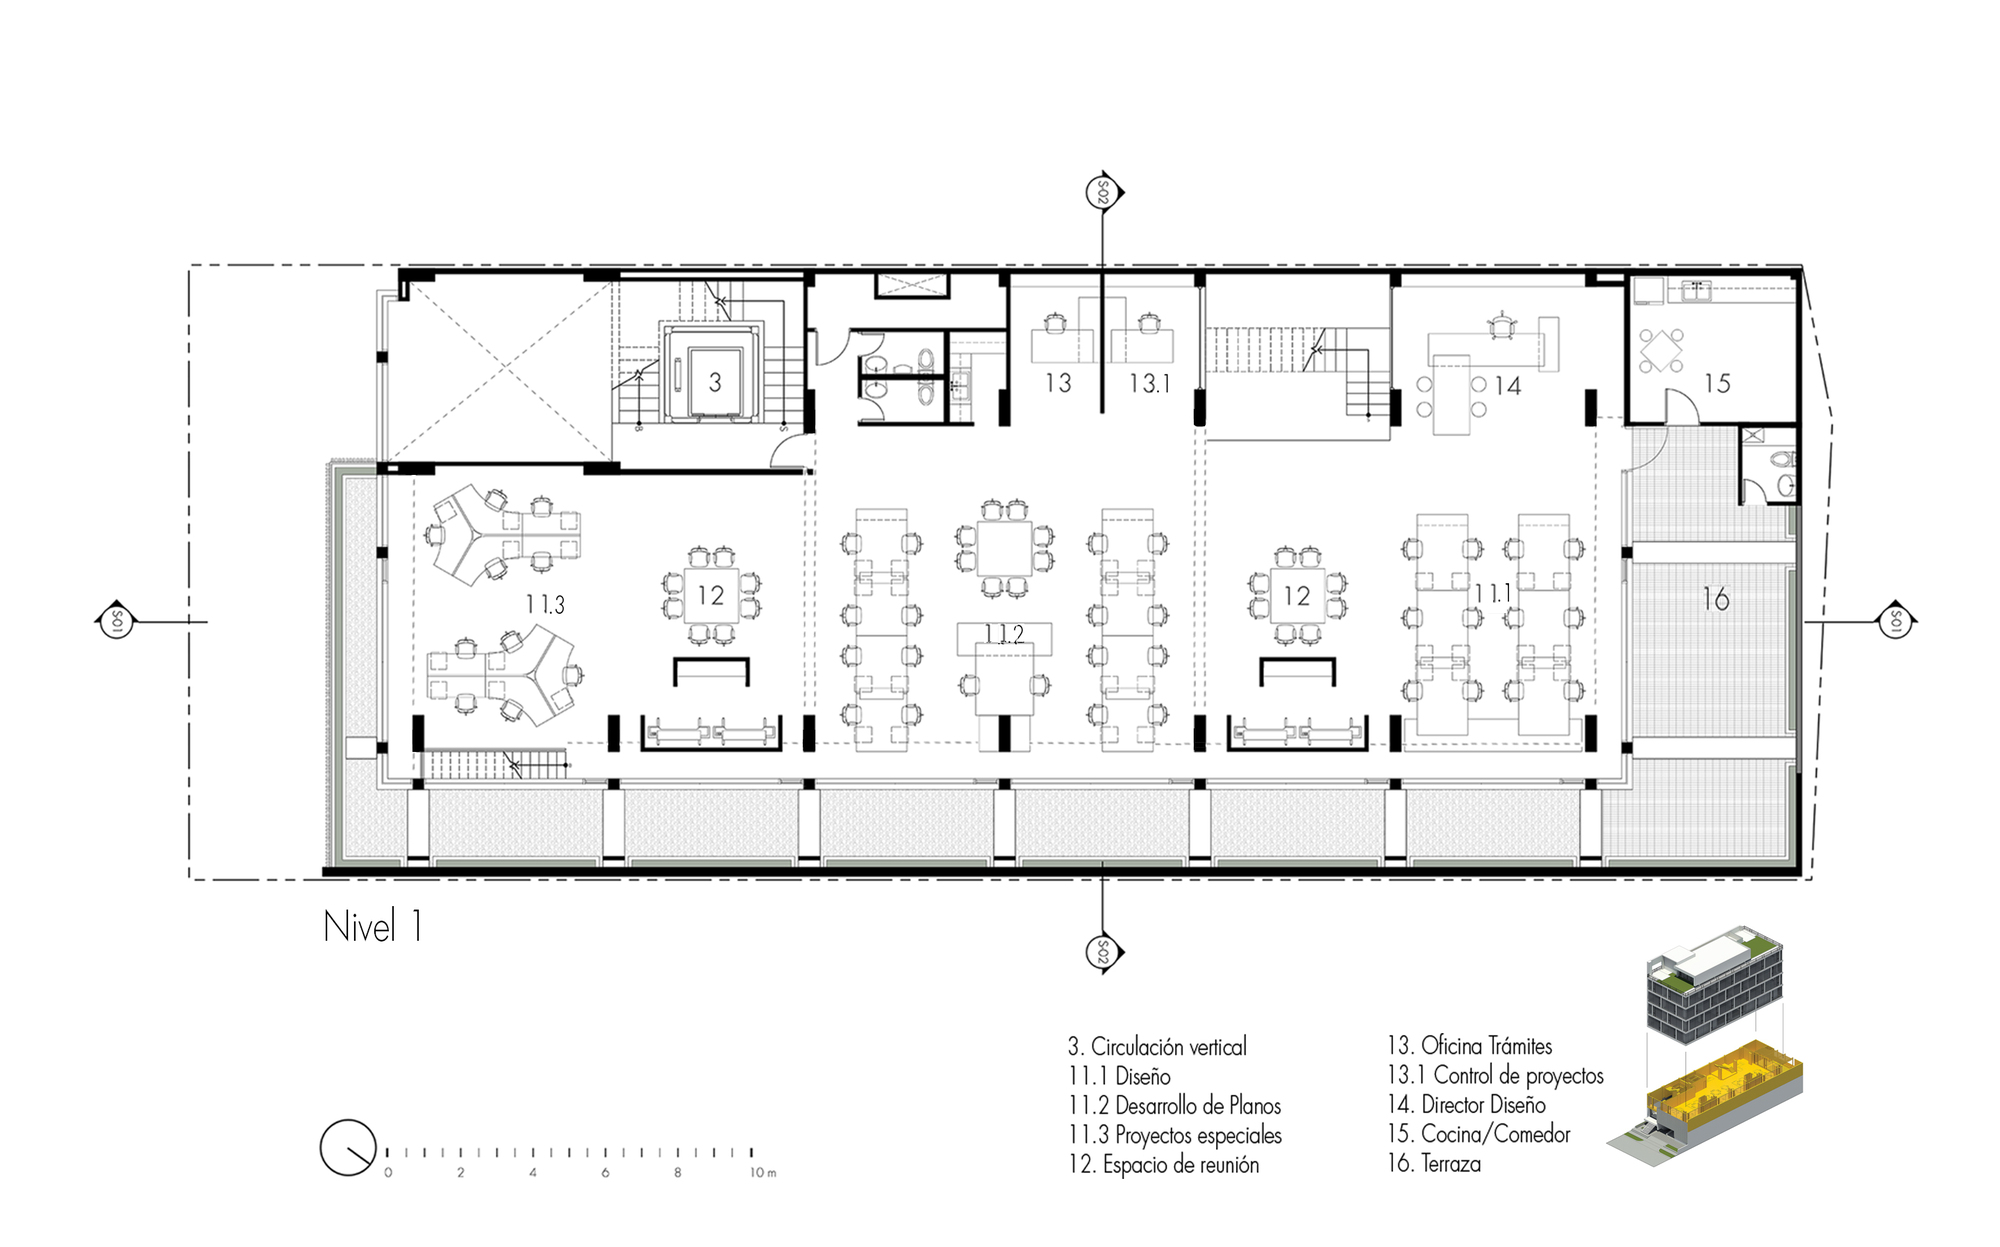 Galer a de ventura offices ventura arquitectos 12 for Espacios de oficinas arquitectura